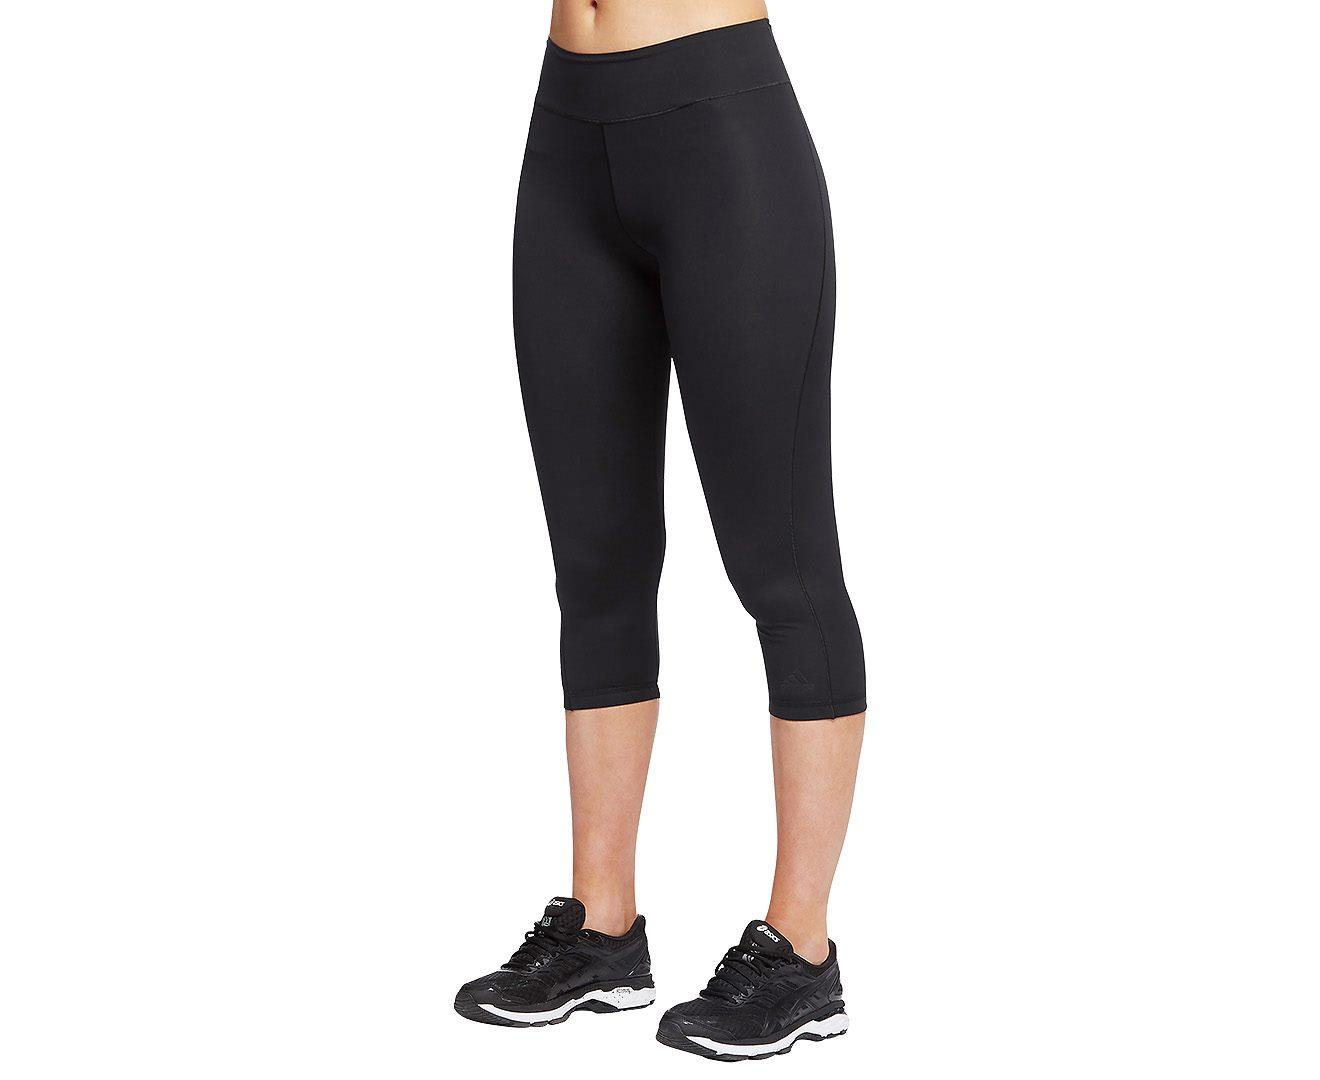 793f7ce3bd1 Adidas Women s 3 4 Tight Black Pants